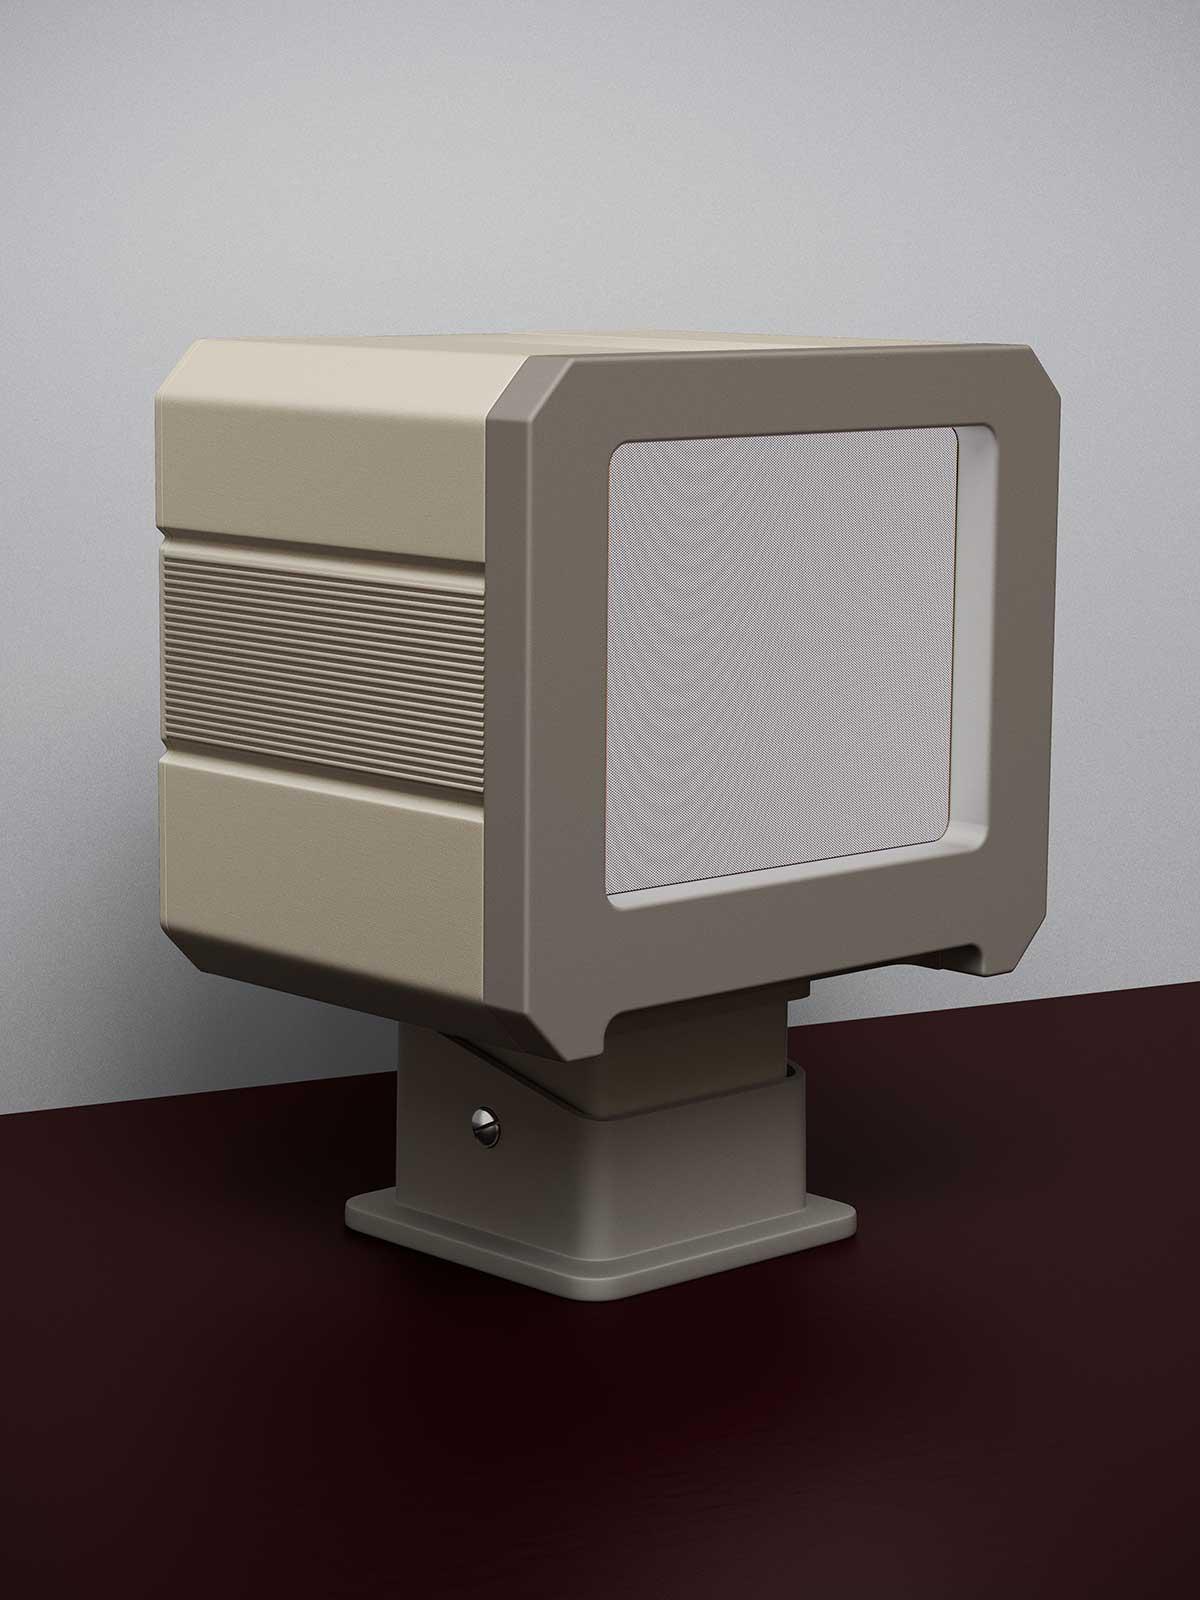 Monitor I 13, CGI Fine Art Print, 52 x 39 cm, 2013